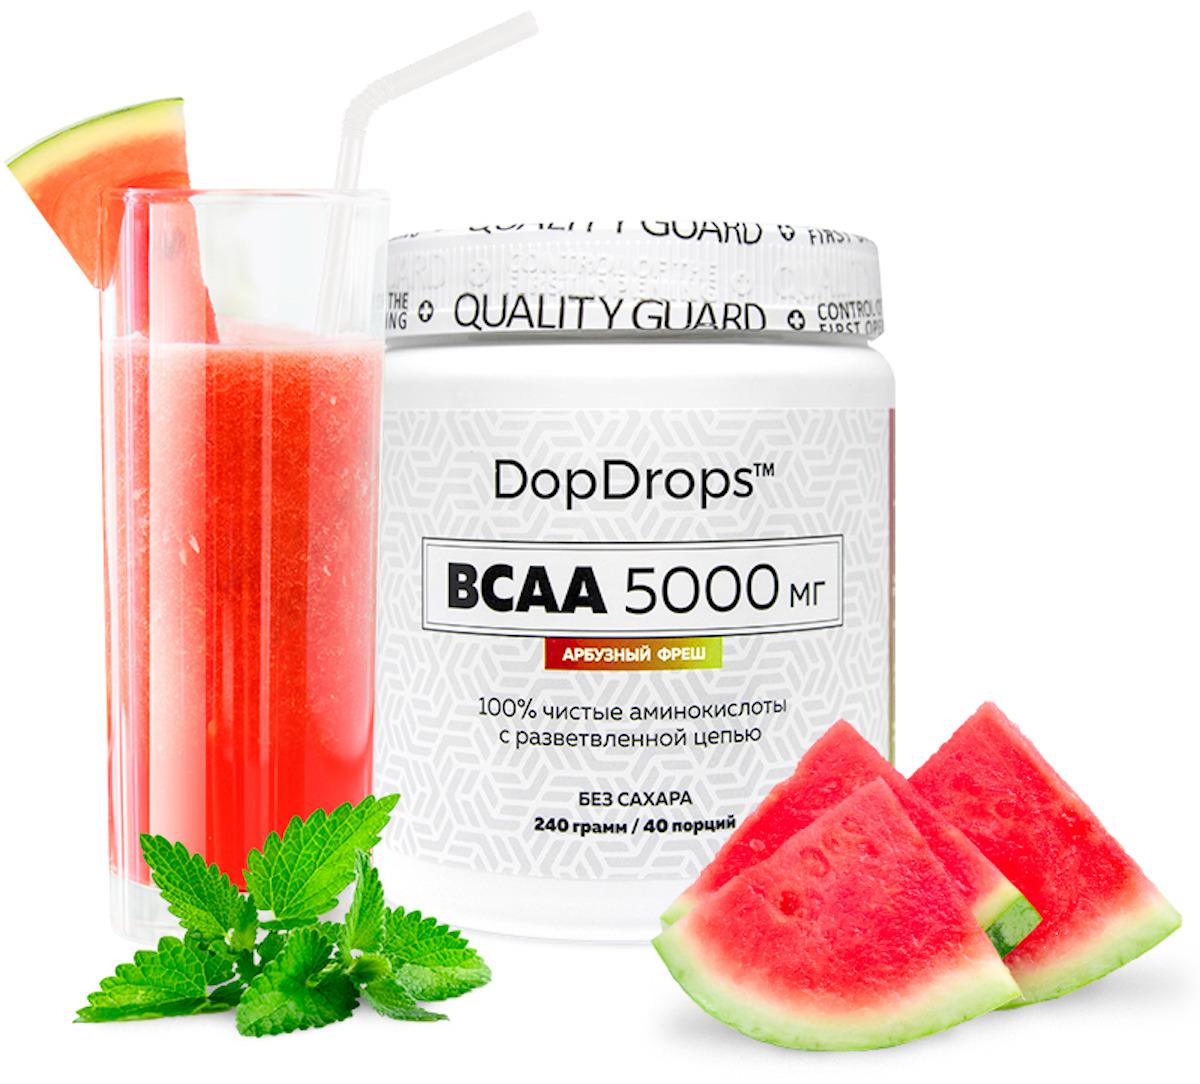 BCAA DopDrops, арбузный фреш, 240 г